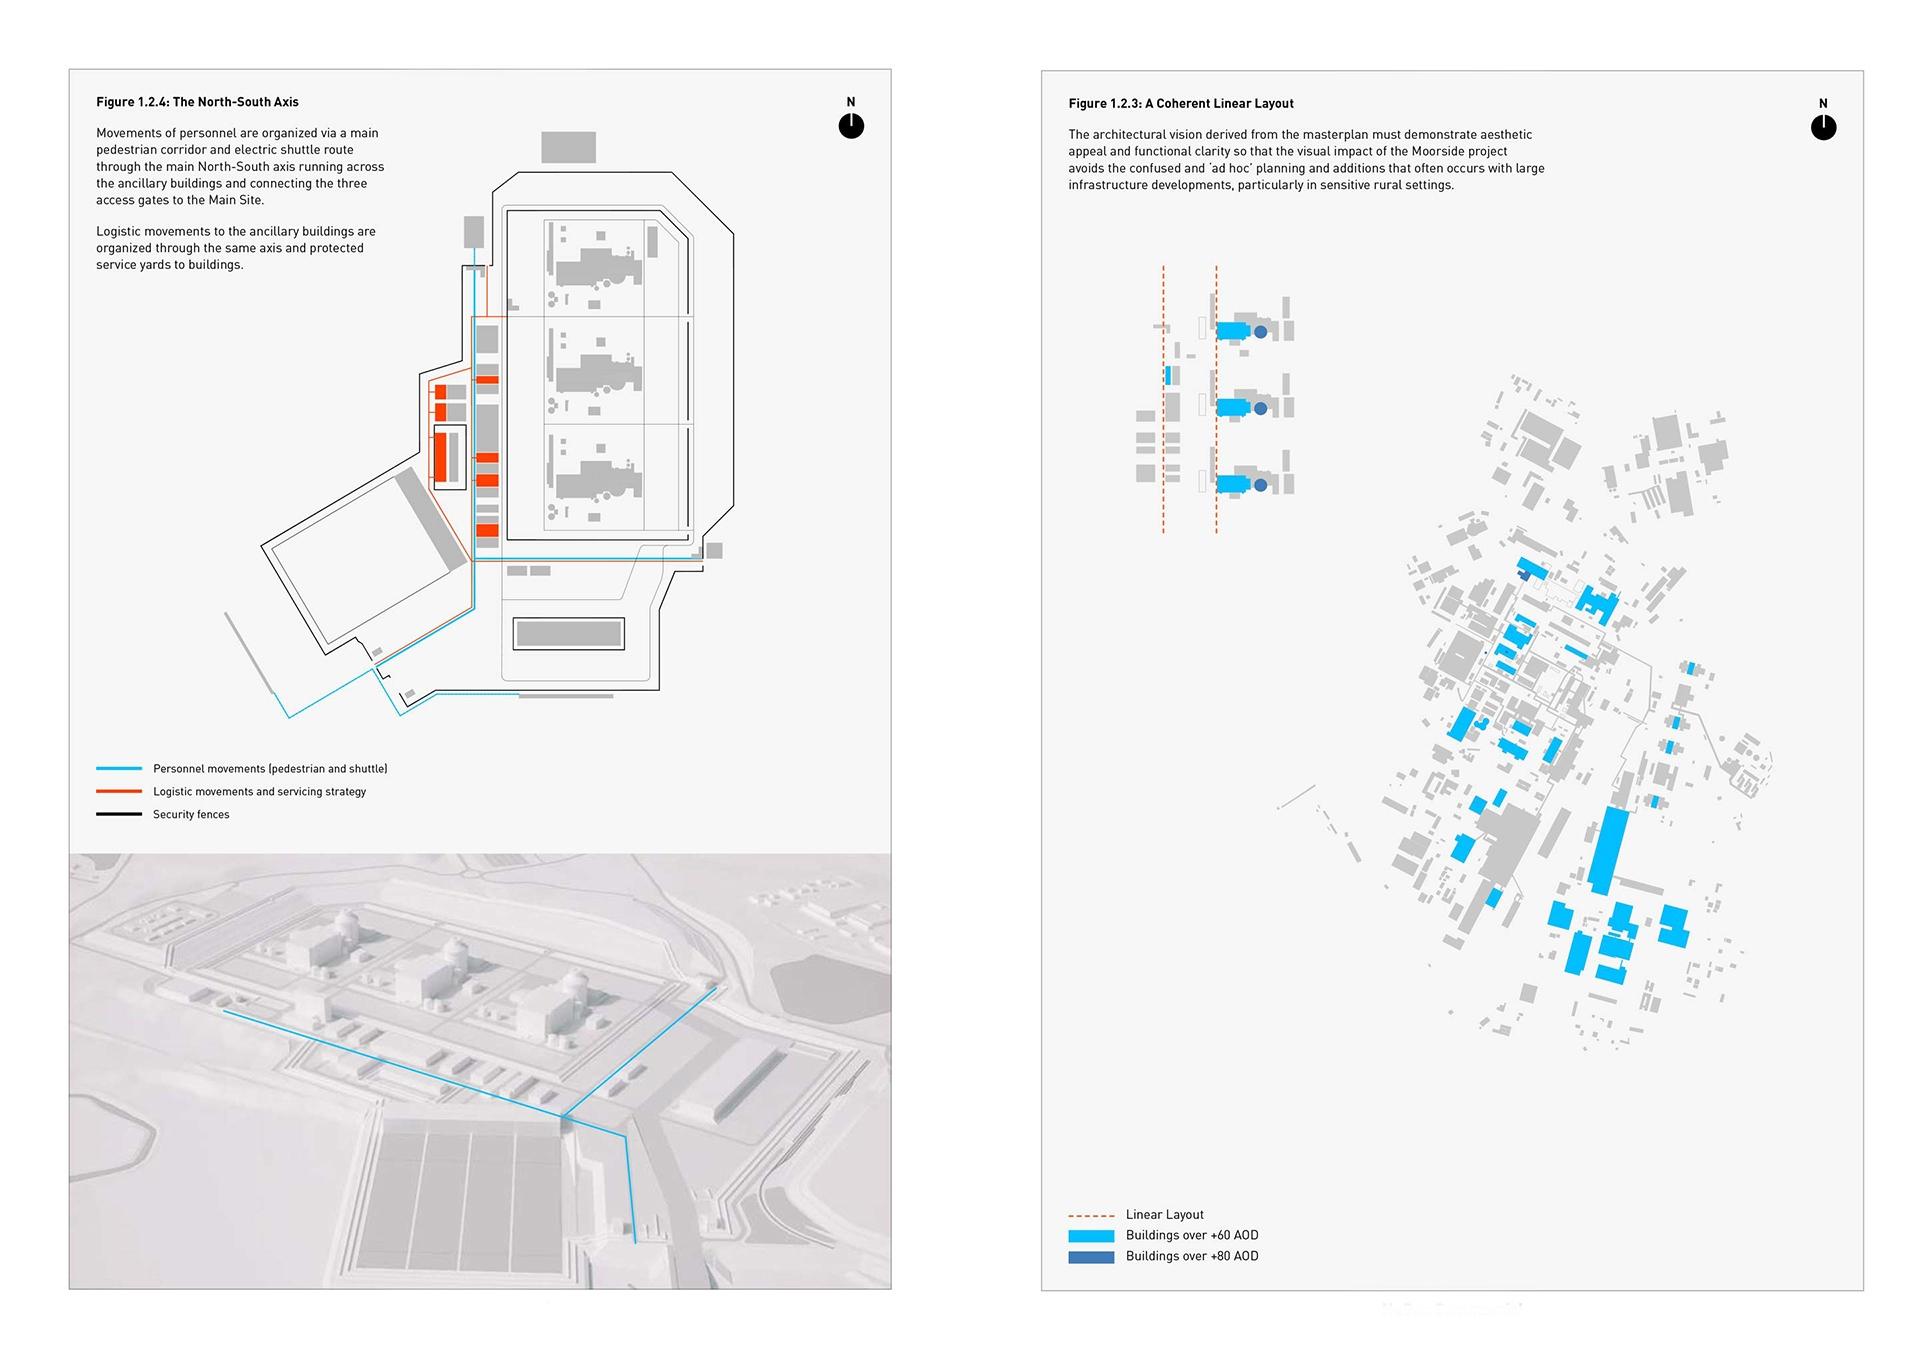 02-Moorside-RIBA-1-Diagram-01__Web_1920_c100.jpg